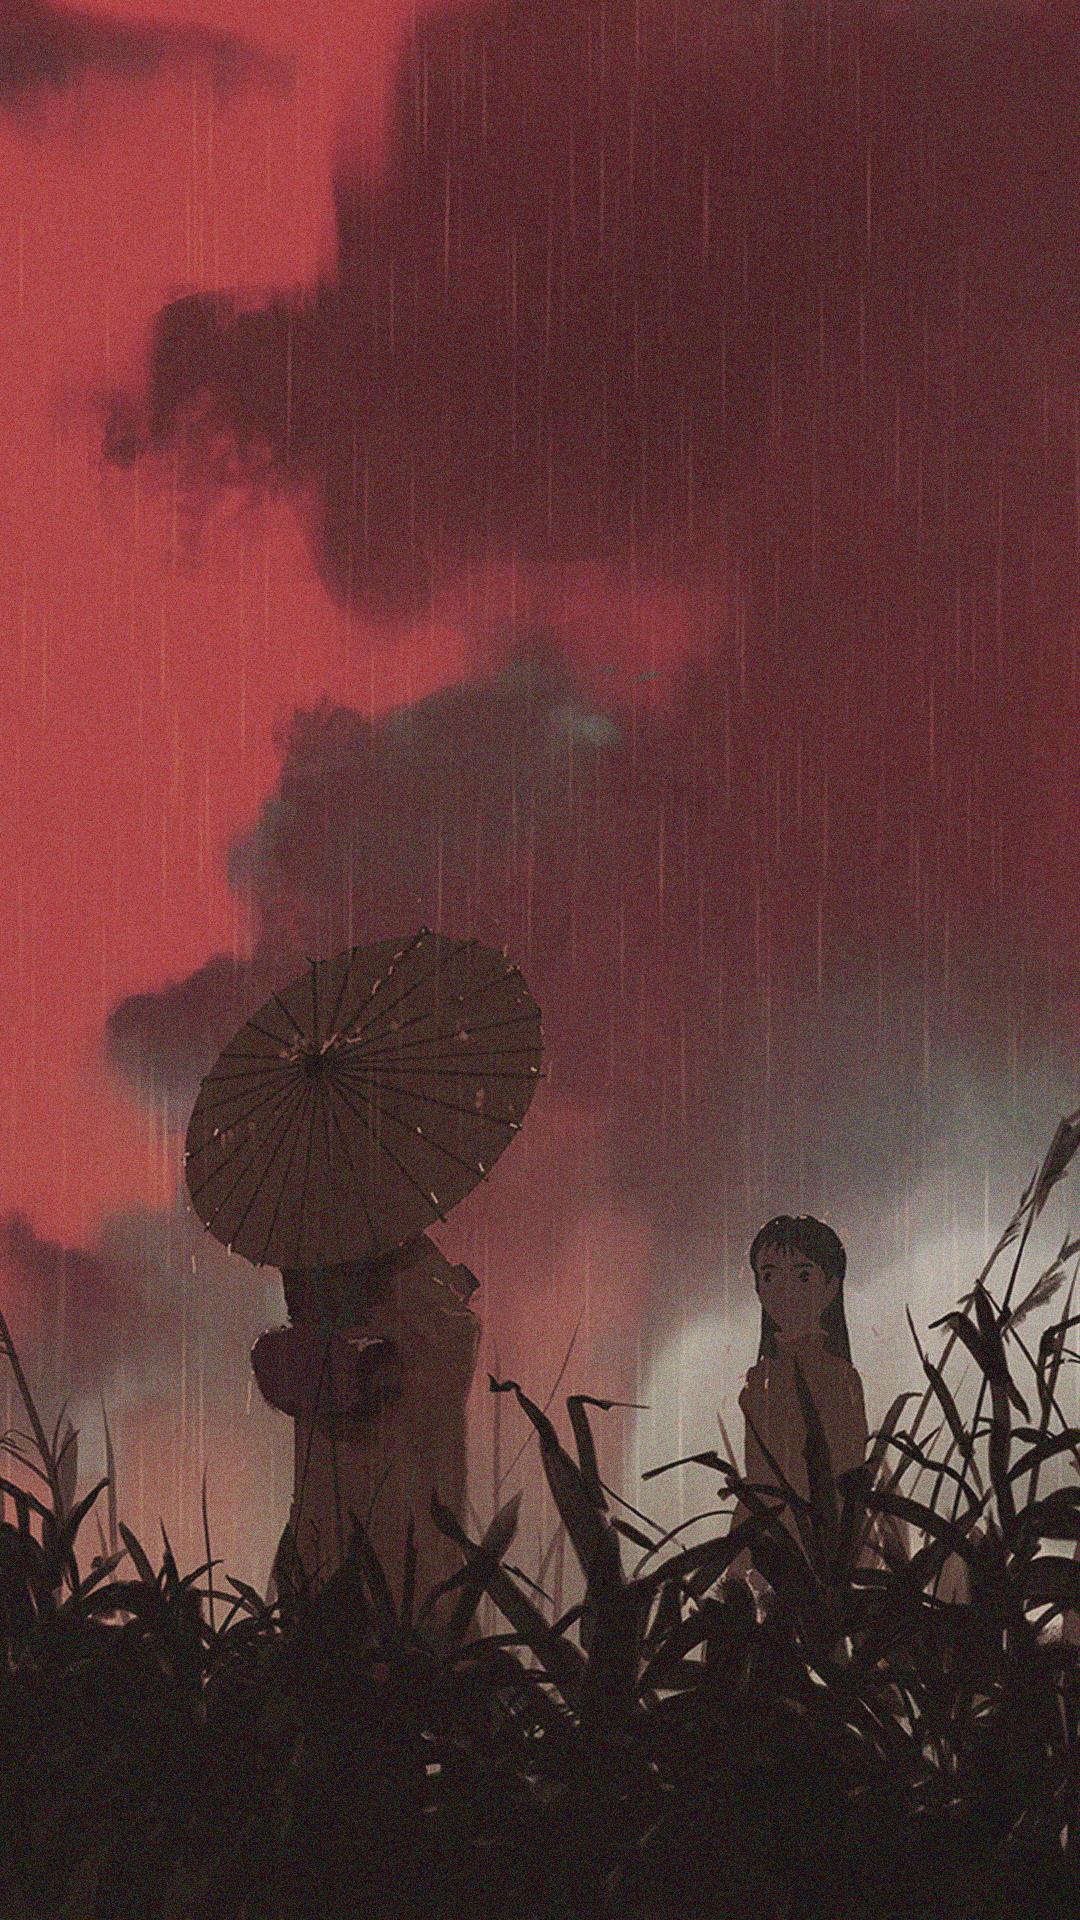 15 Anime Phone Wallpapers Heroscreen Cool Wallpapers